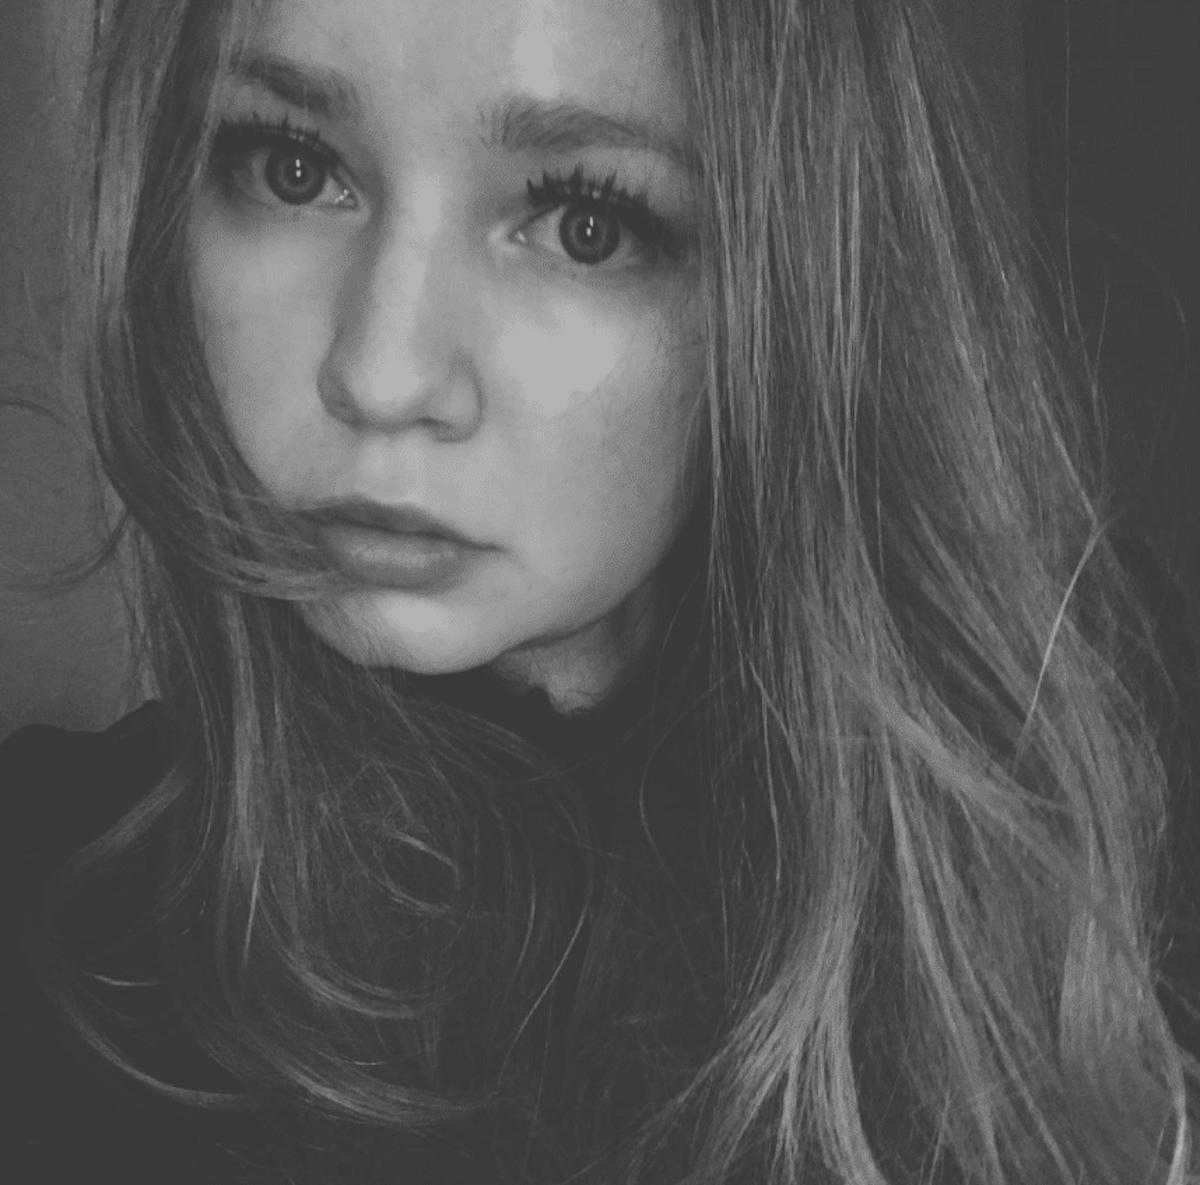 Anna Sorokin indictment